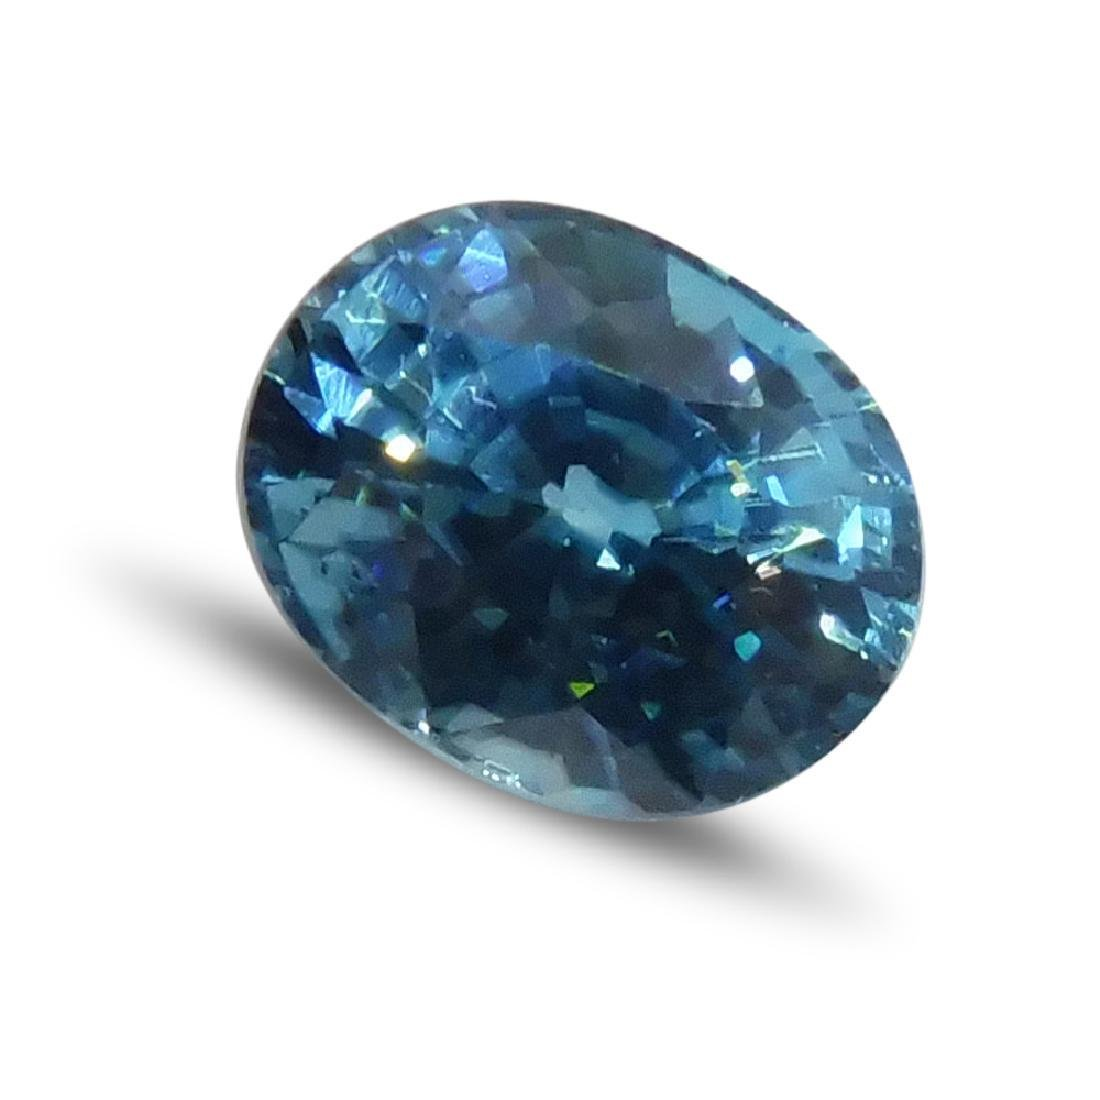 4.21 Carat Loose Oval Blue Zircon